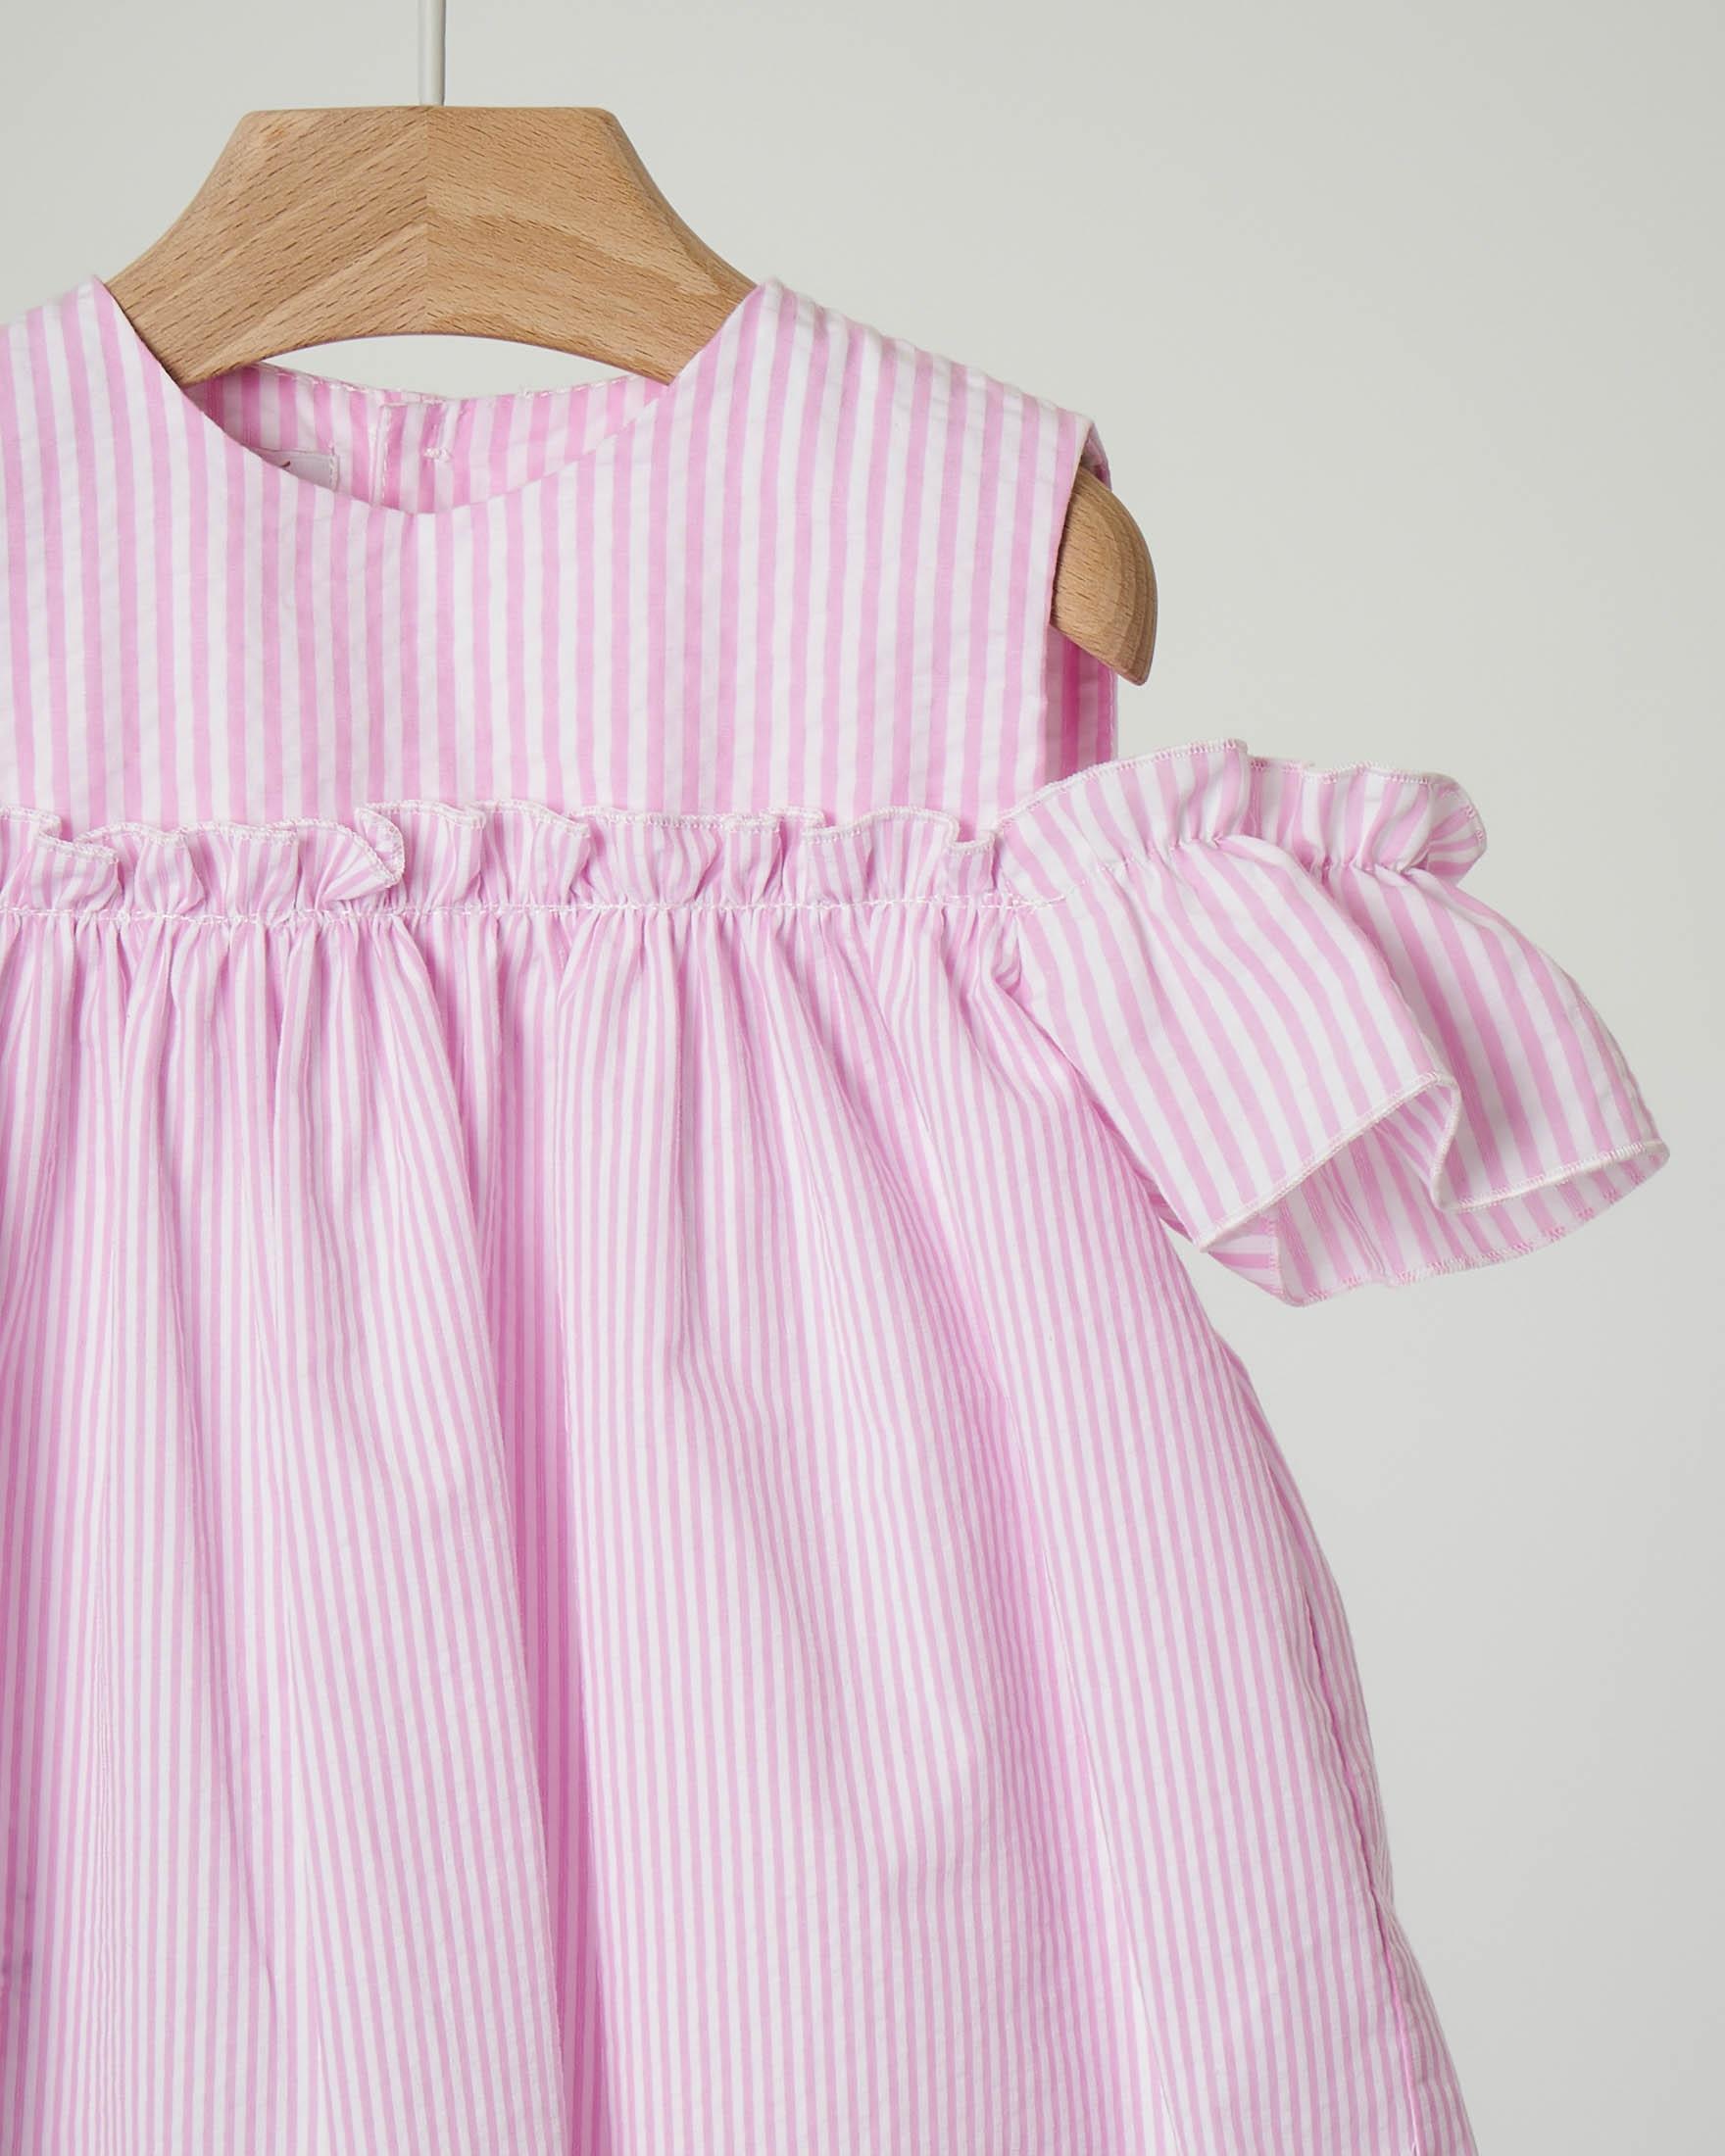 Camicia rosa e bianca seersucker